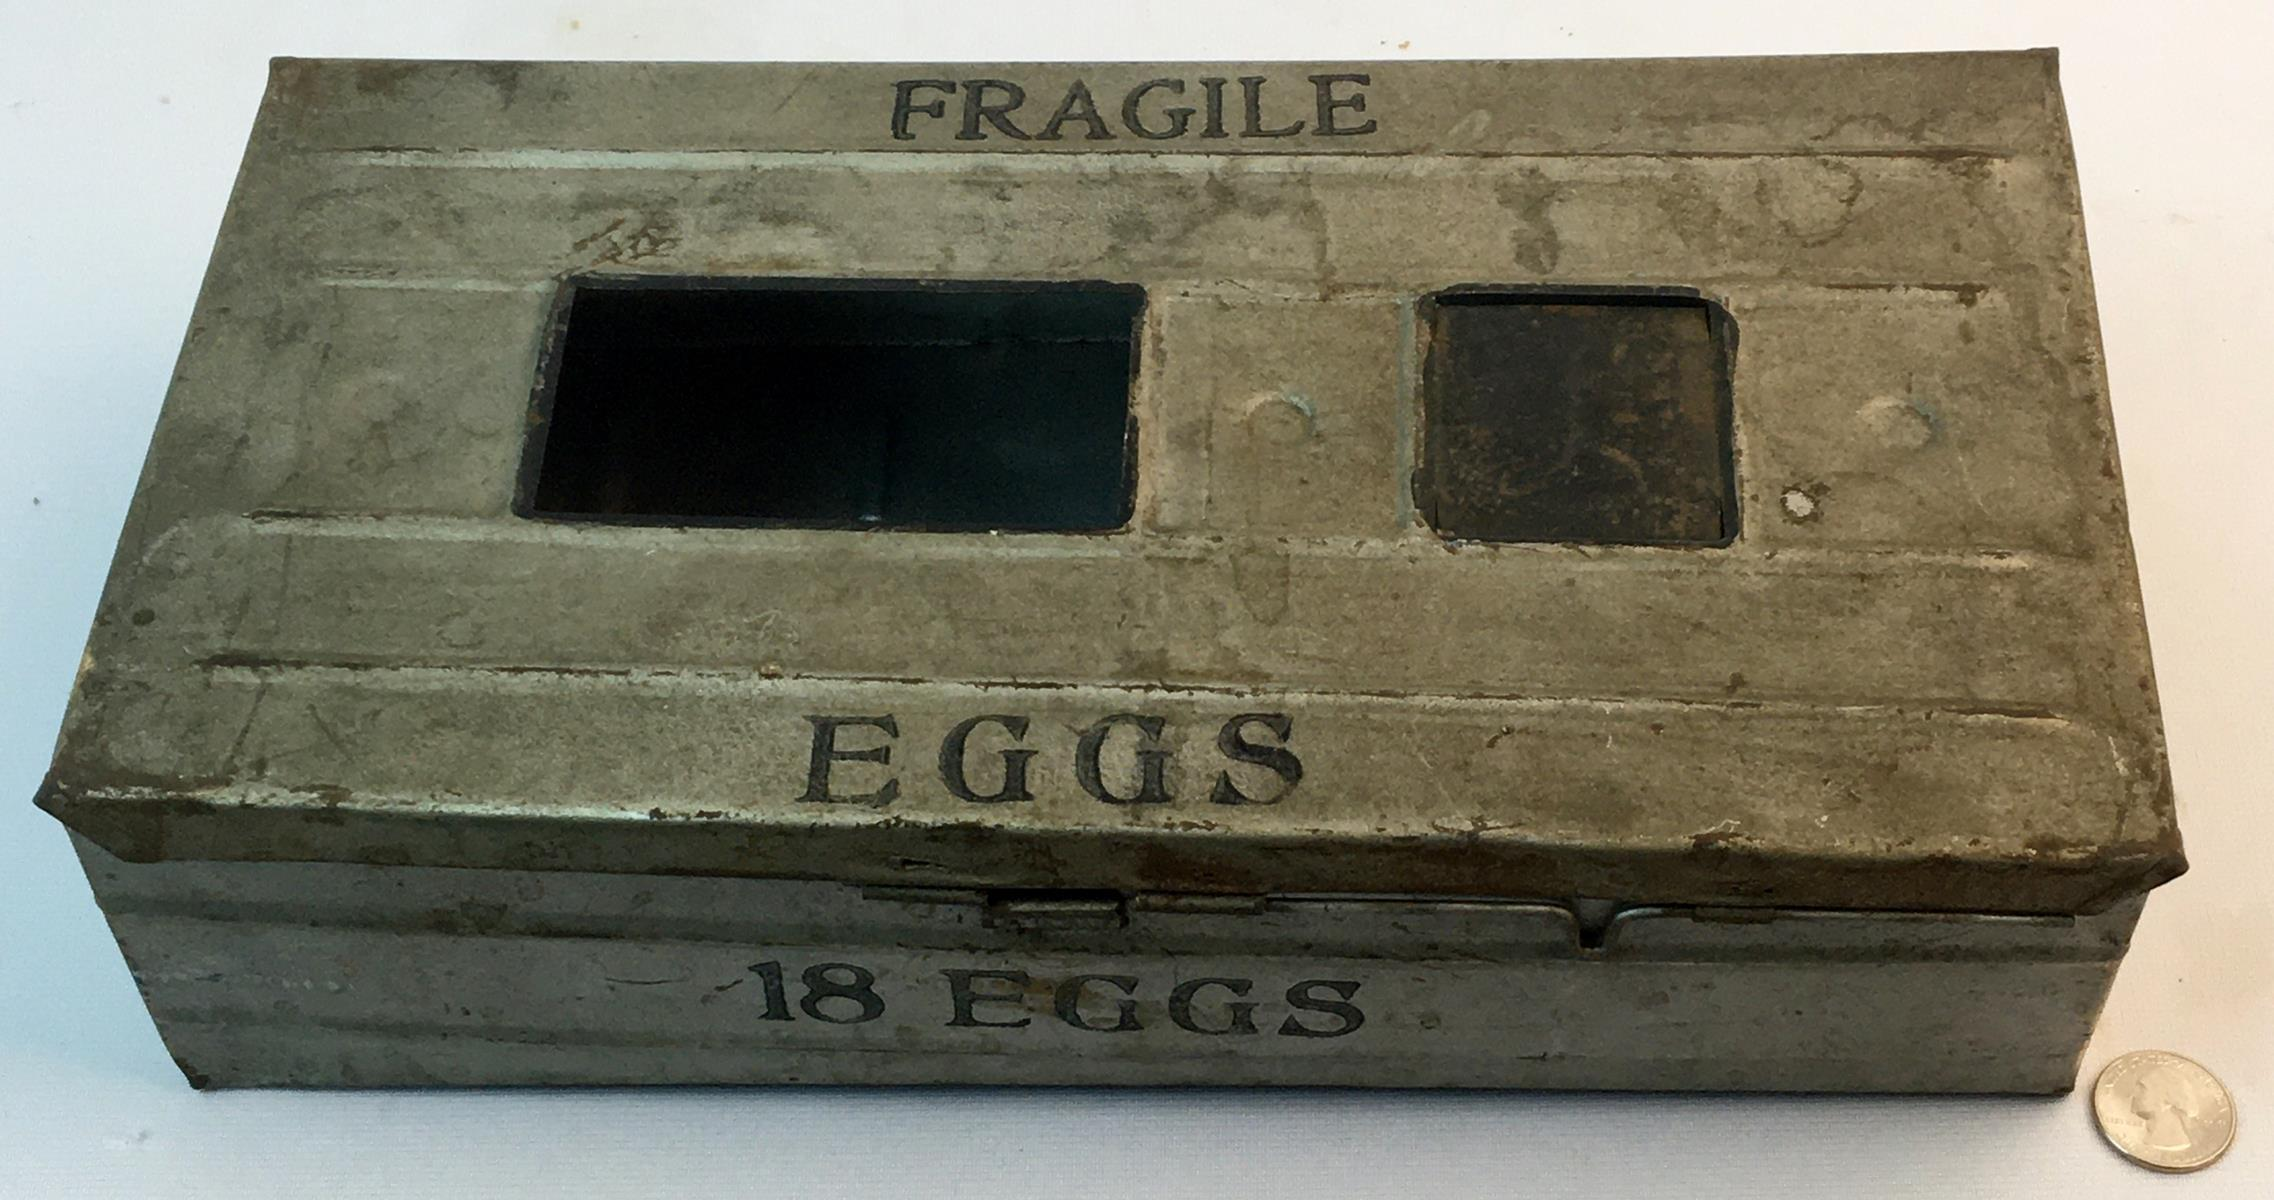 Antique c. 1920 Metal One and Half Dozen Egg Carrier / Mailer Crate